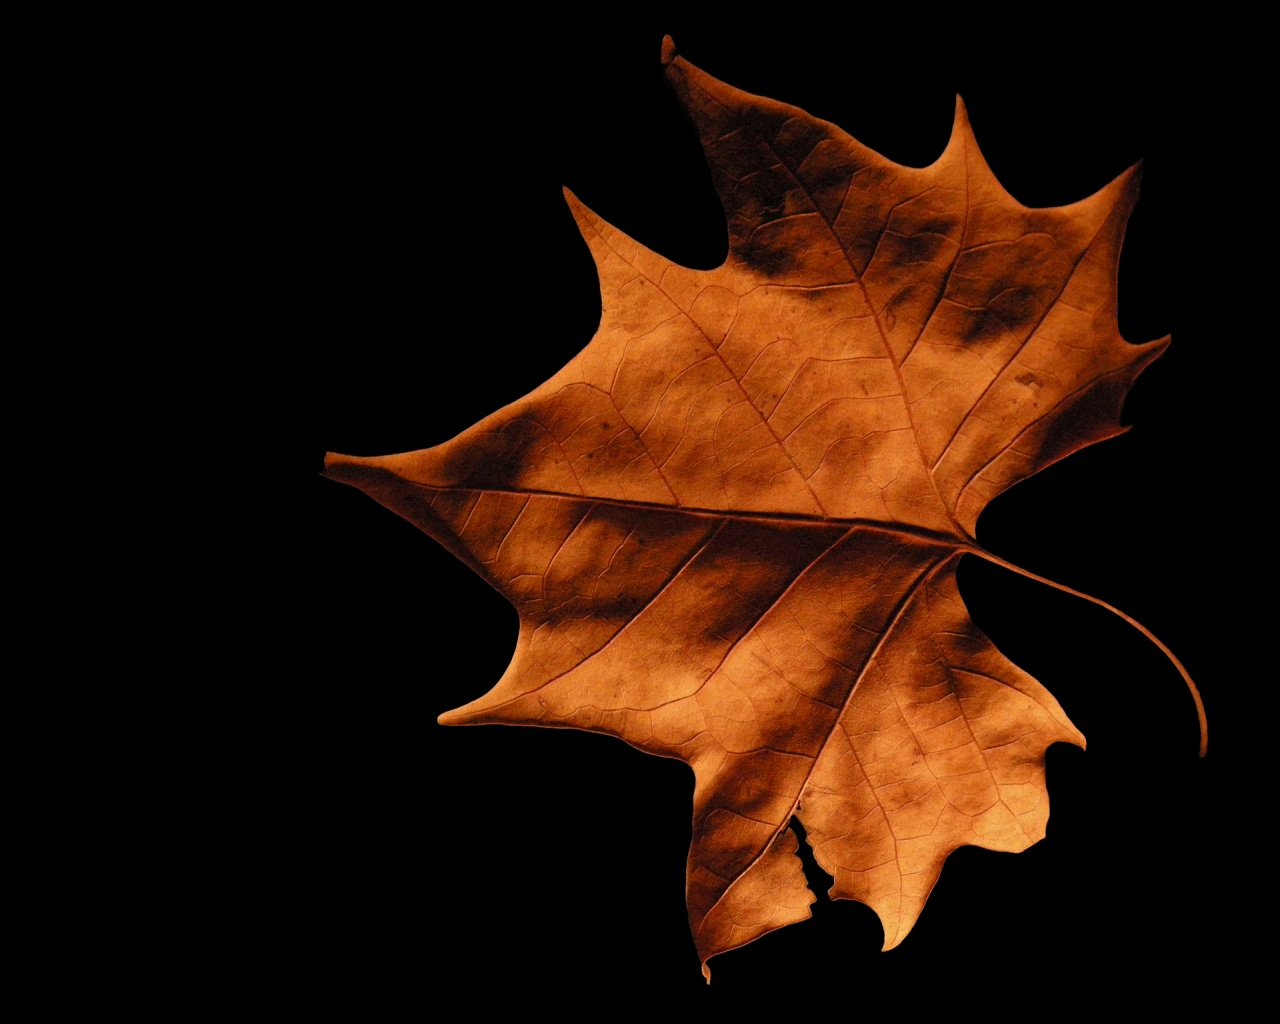 brown leaf 1280x1024 wallpaper download page 210005 1280x1024